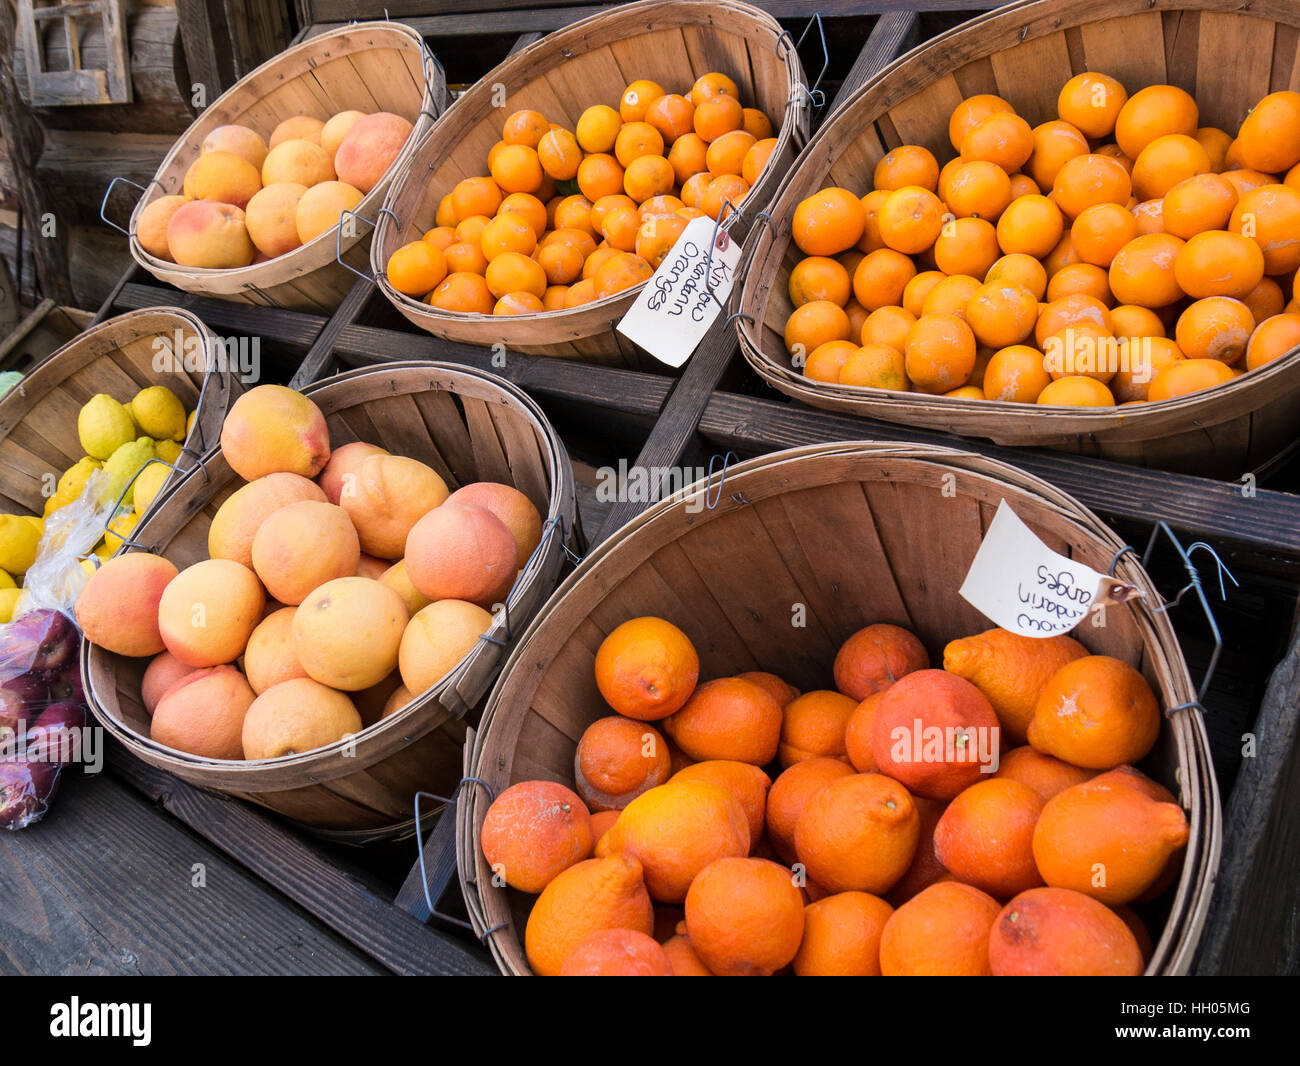 Singh Farms farmer's market, Scottsdale, Arizona. Photo Stock